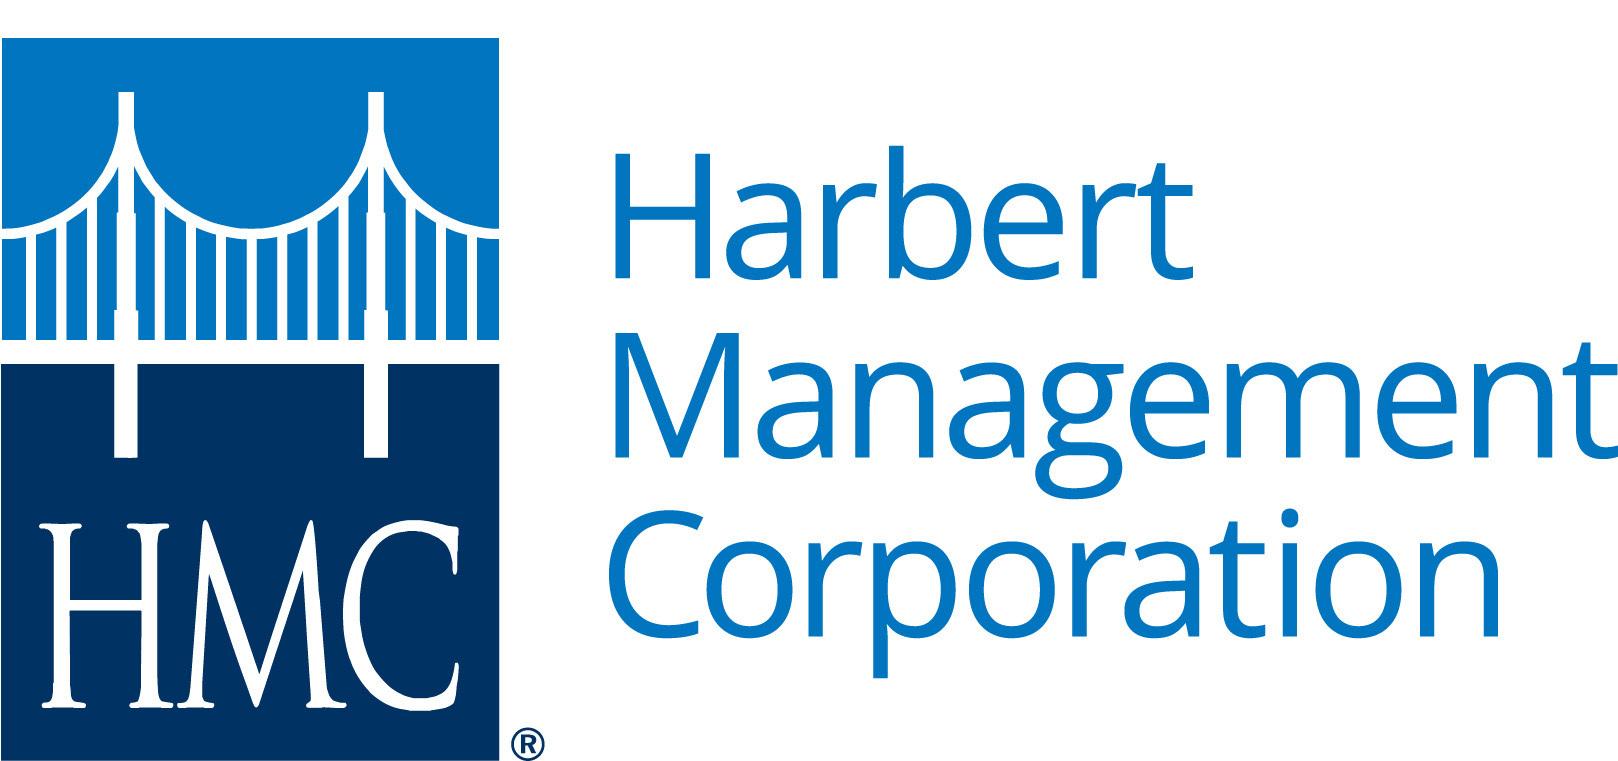 HarbertManagementCorporation_LOGO_2_color.jpg